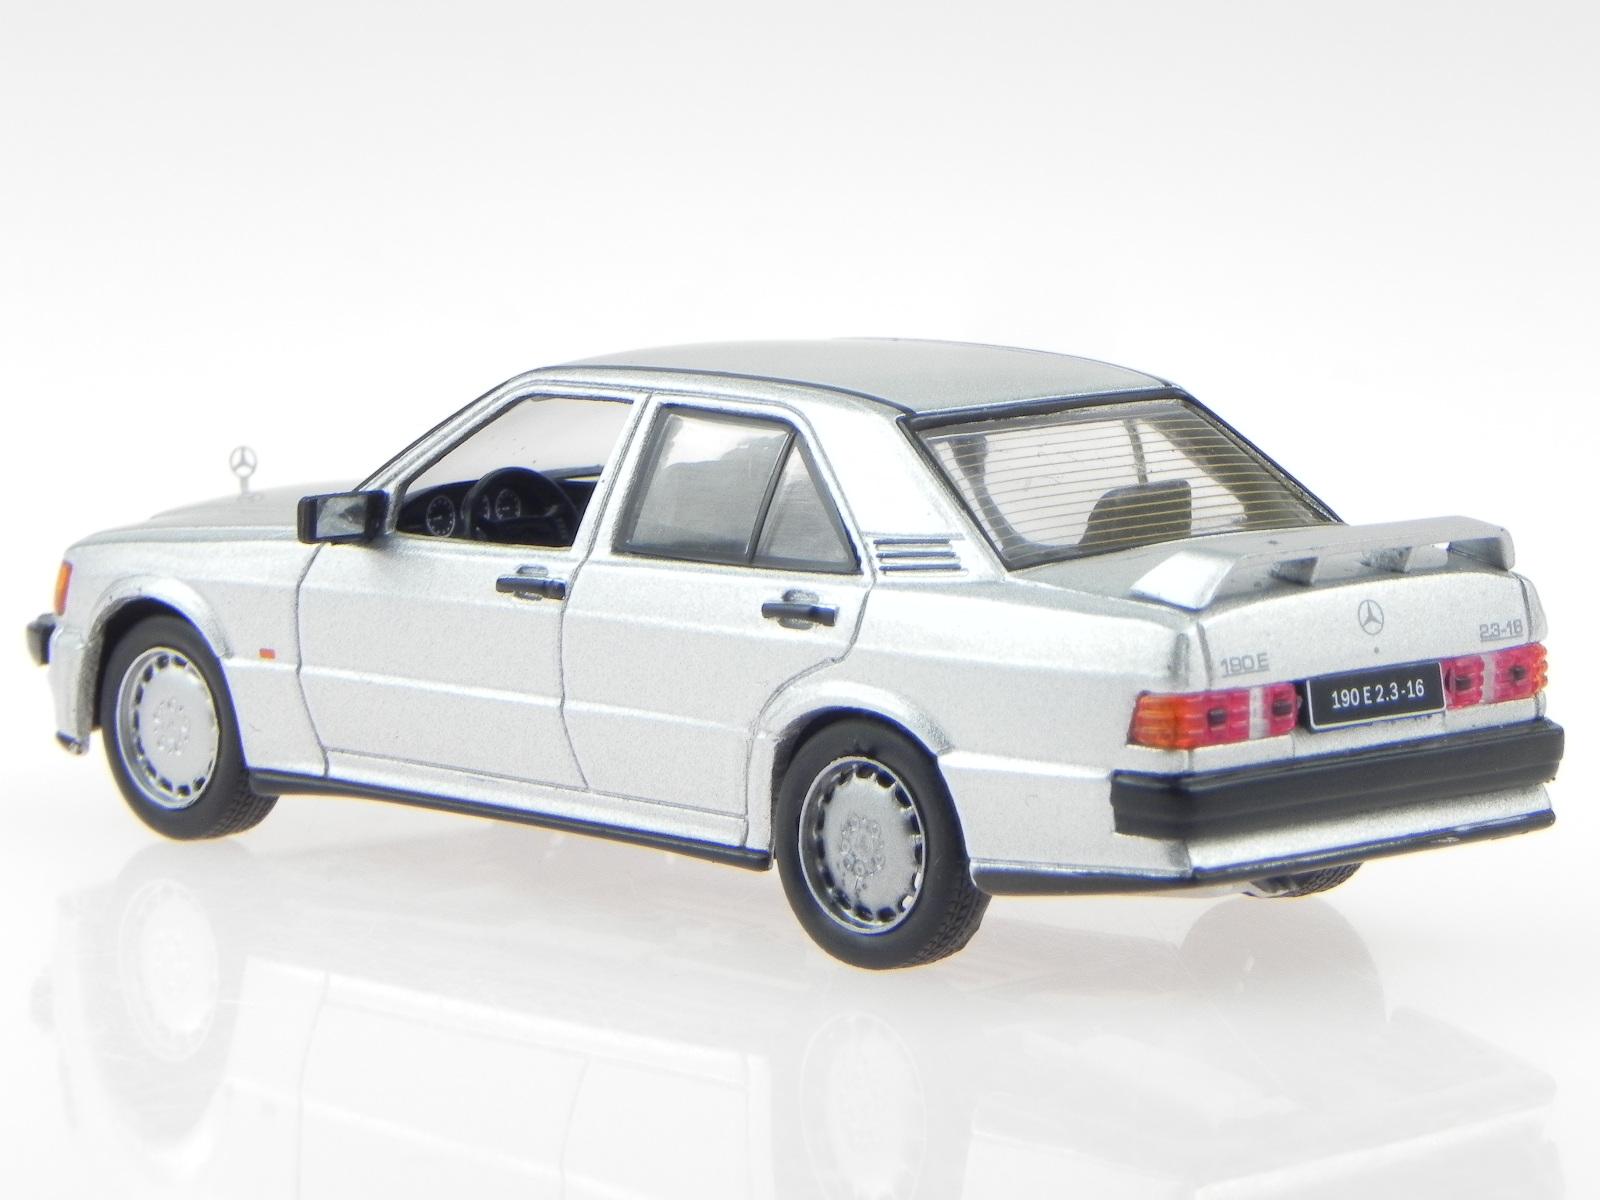 mercedes w201 190e 2 5 16 1988 modellauto wb246 whitebox 1. Black Bedroom Furniture Sets. Home Design Ideas